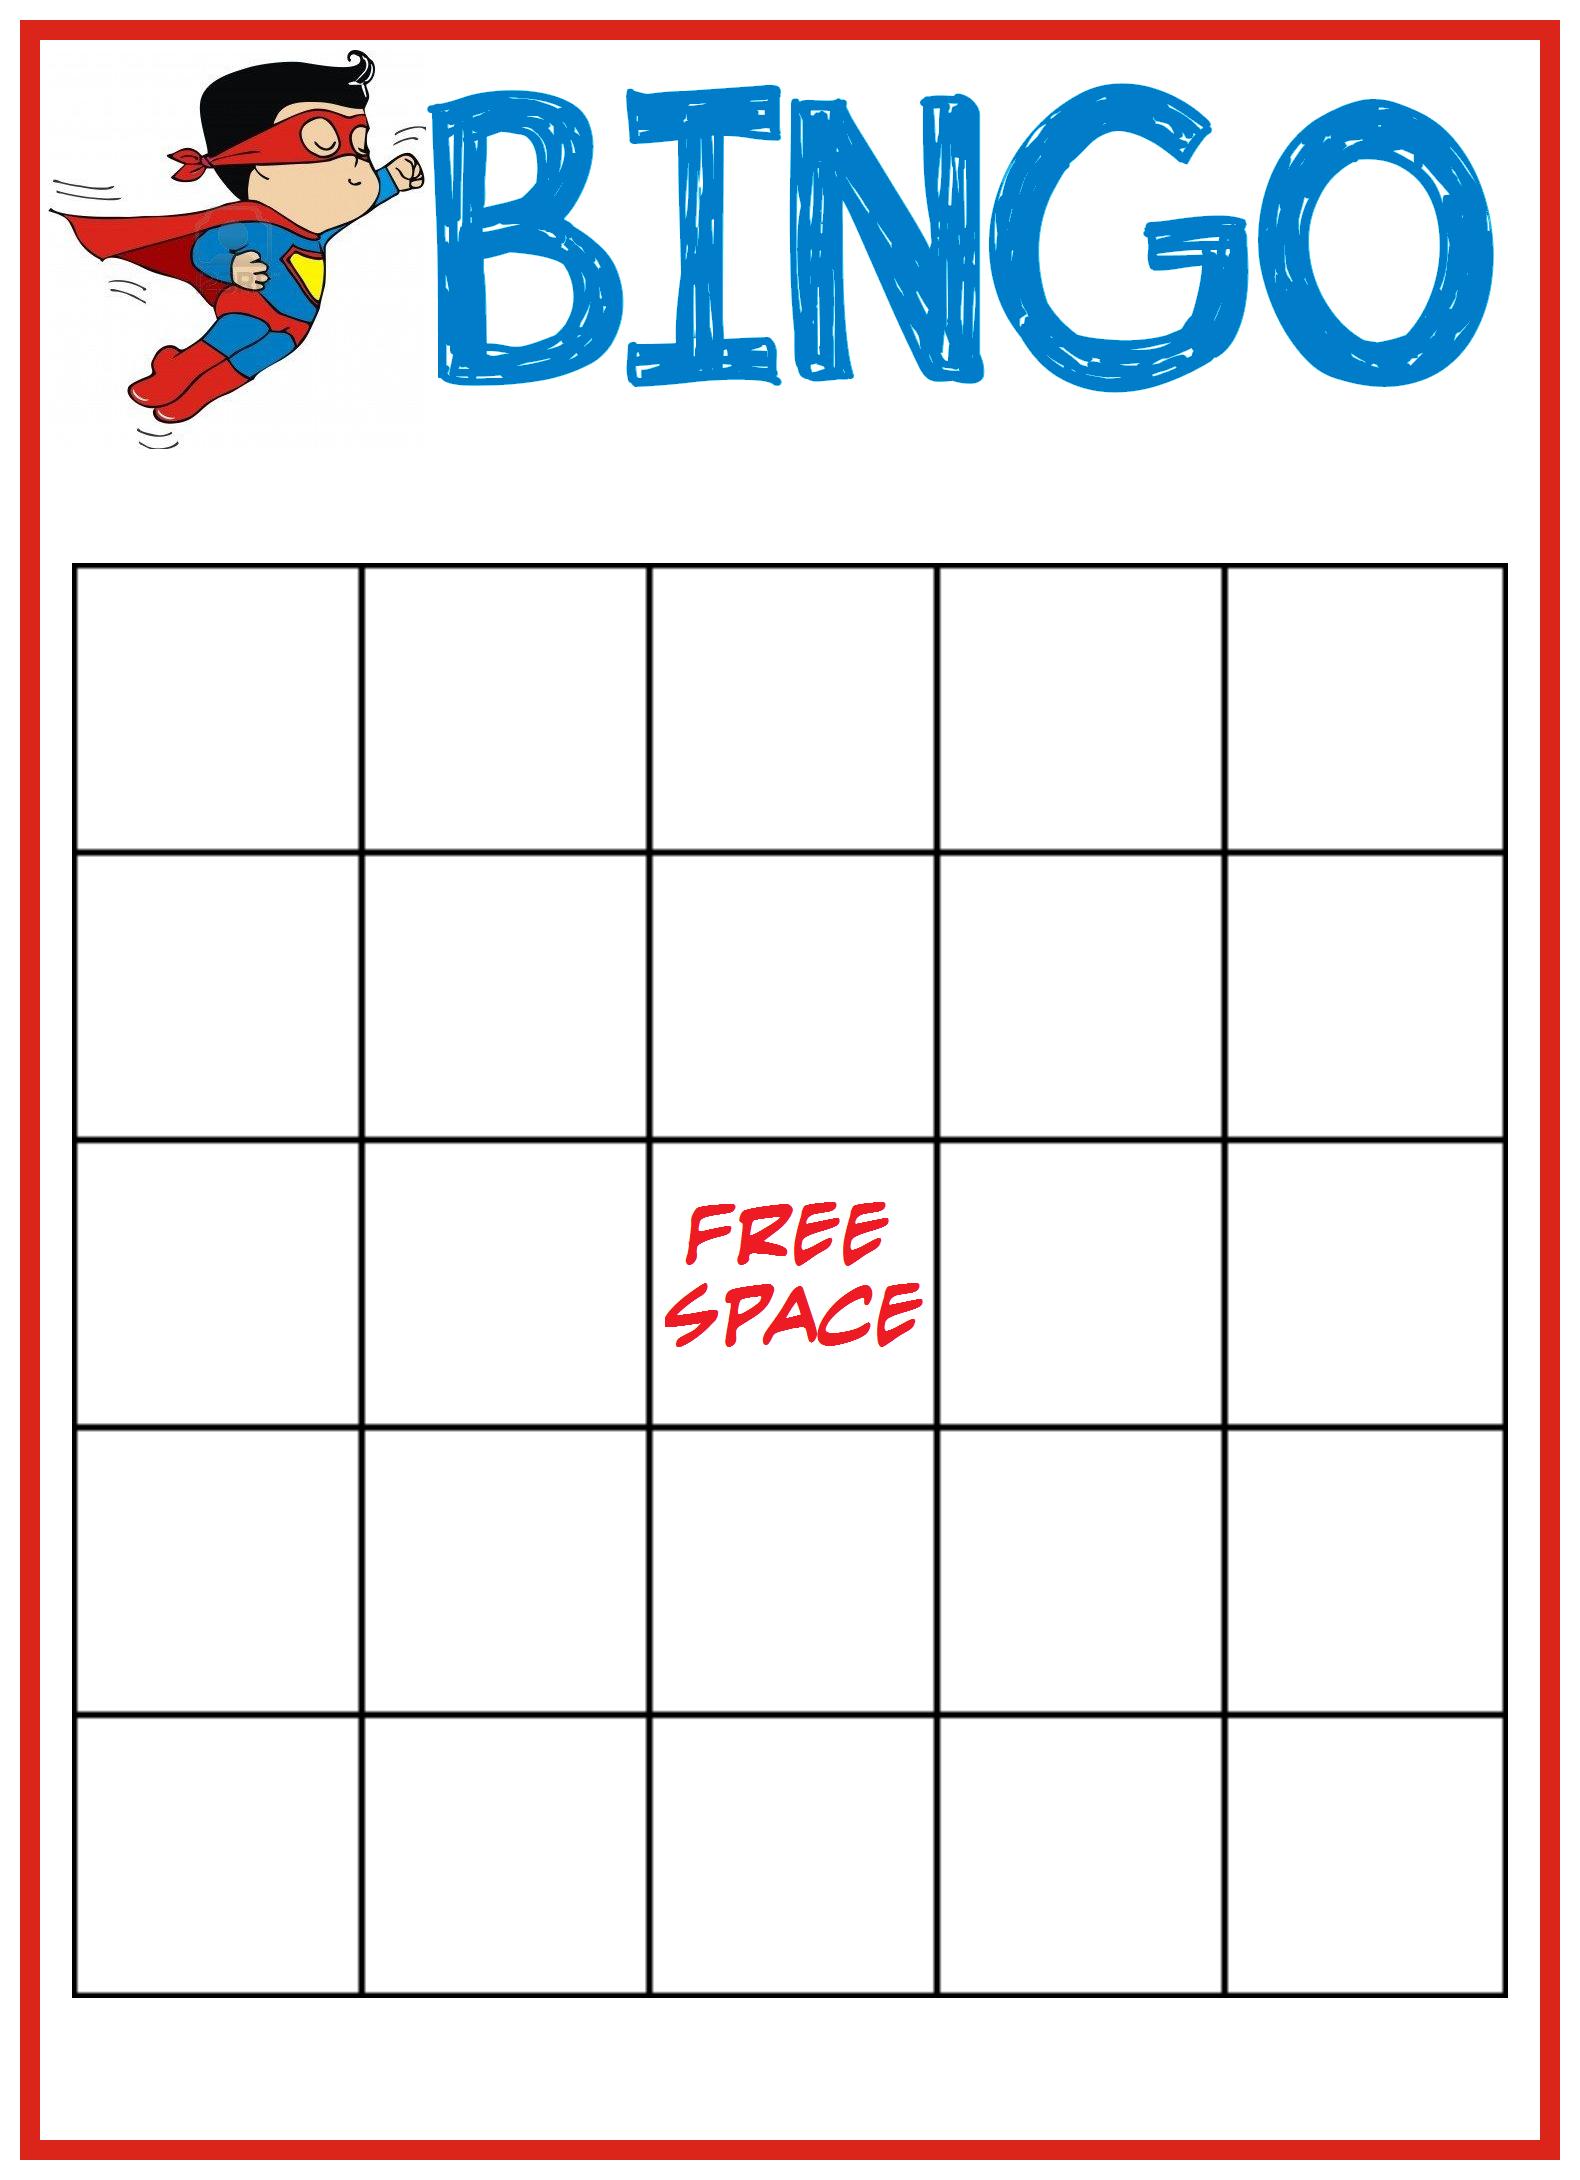 37+ Blank bingo card clipart ideas